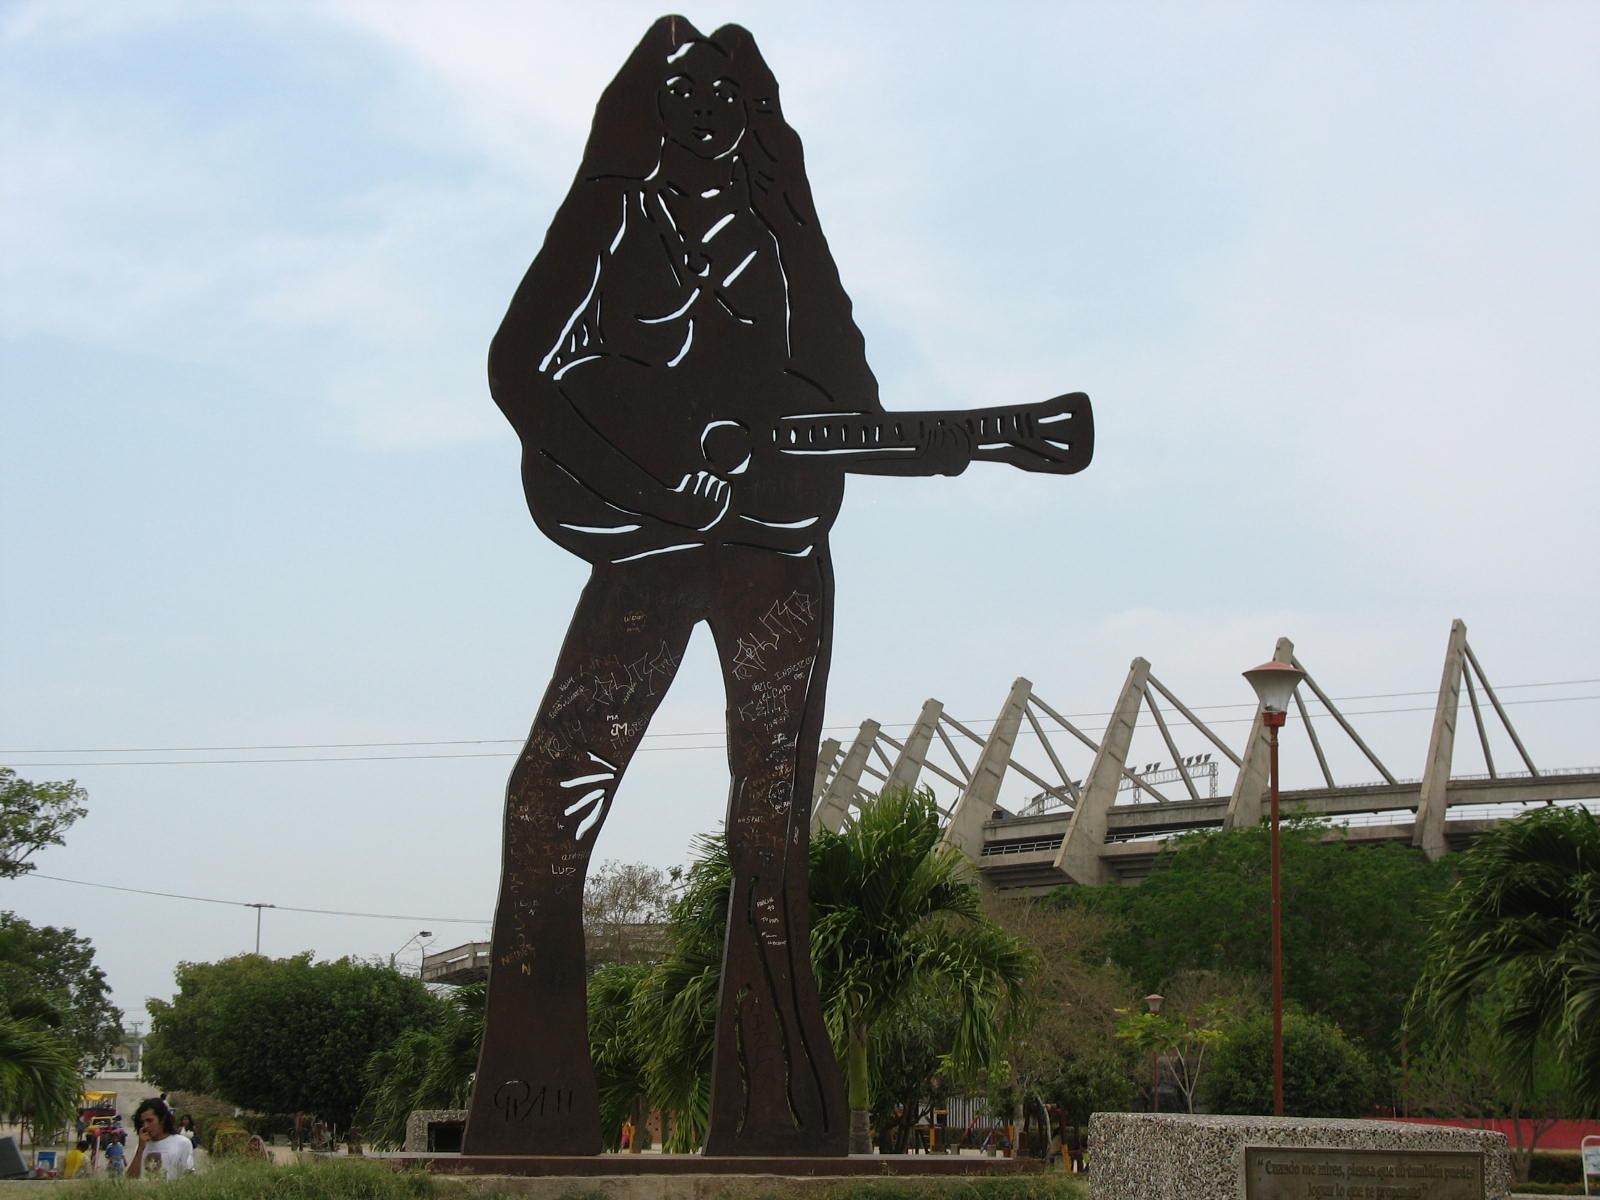 http://1.bp.blogspot.com/_Nuta_CQvImI/TP3_OG0yPMI/AAAAAAAAEsY/jL8N-slYzXo/s1600/Statue-of-Shakira-Escultura-de-Shakira-in-Barranquilla-Colombia.jpg